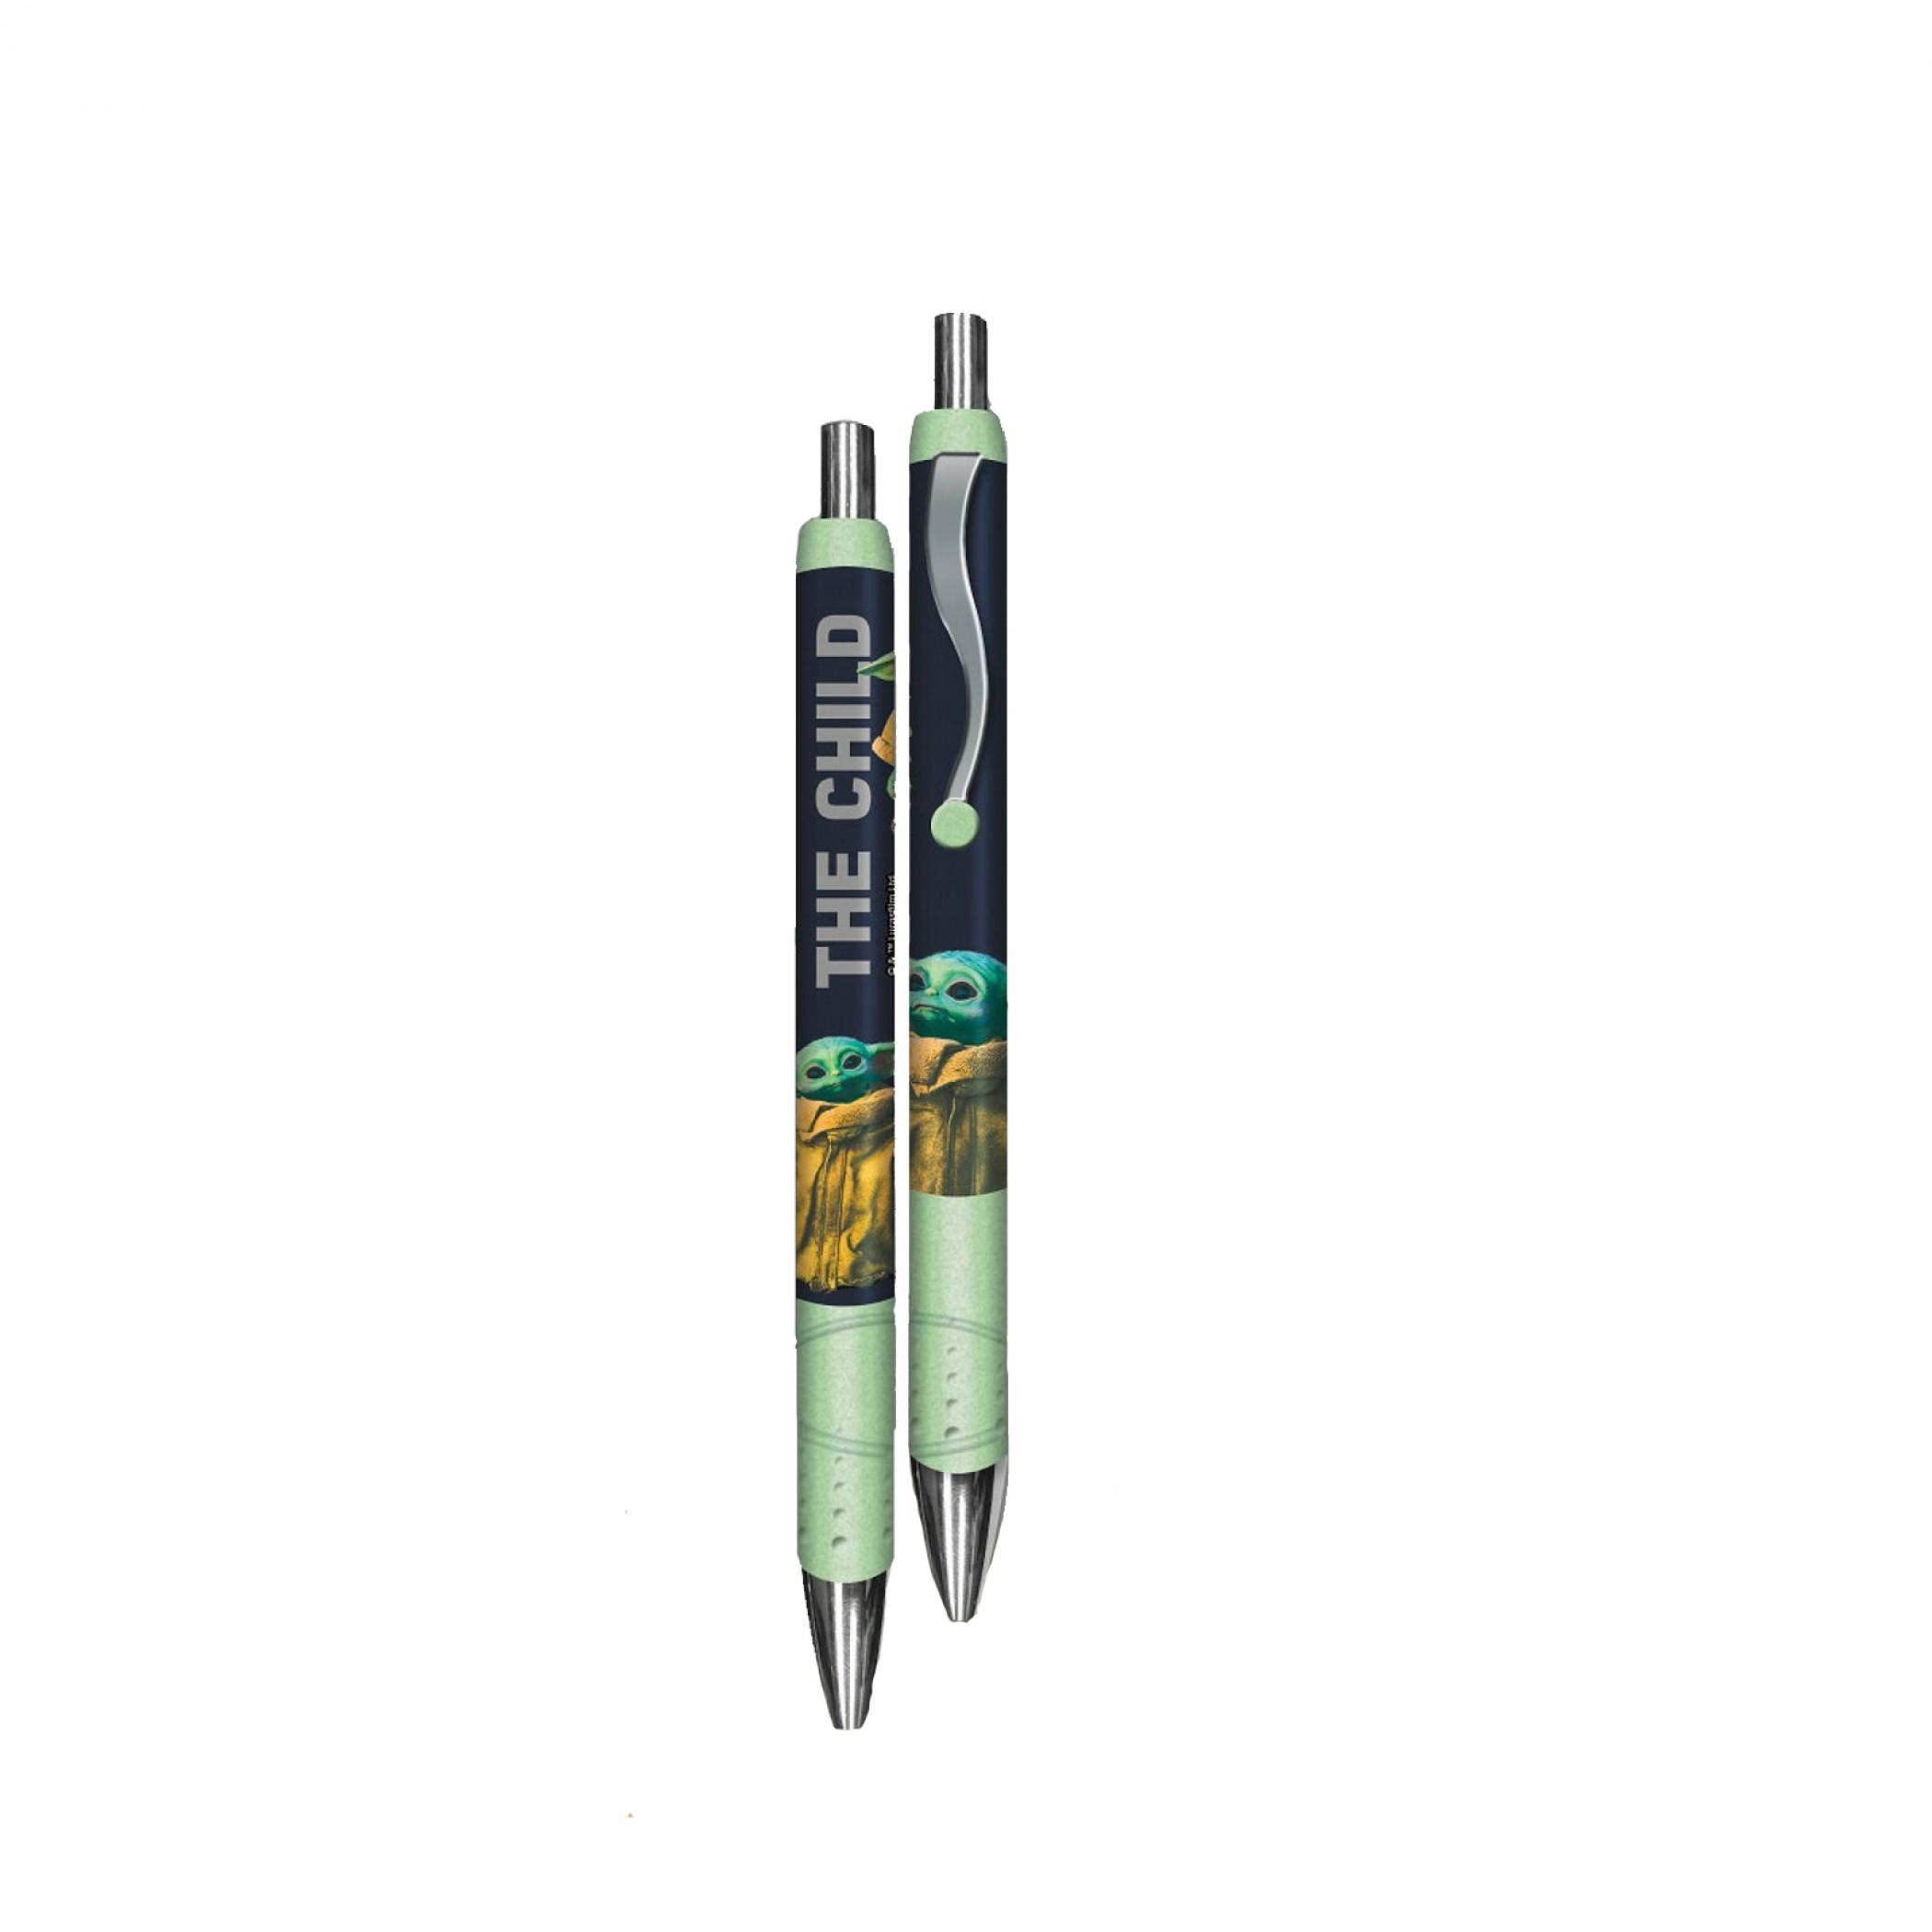 The Mandalorian The Child 2-Pack Pens